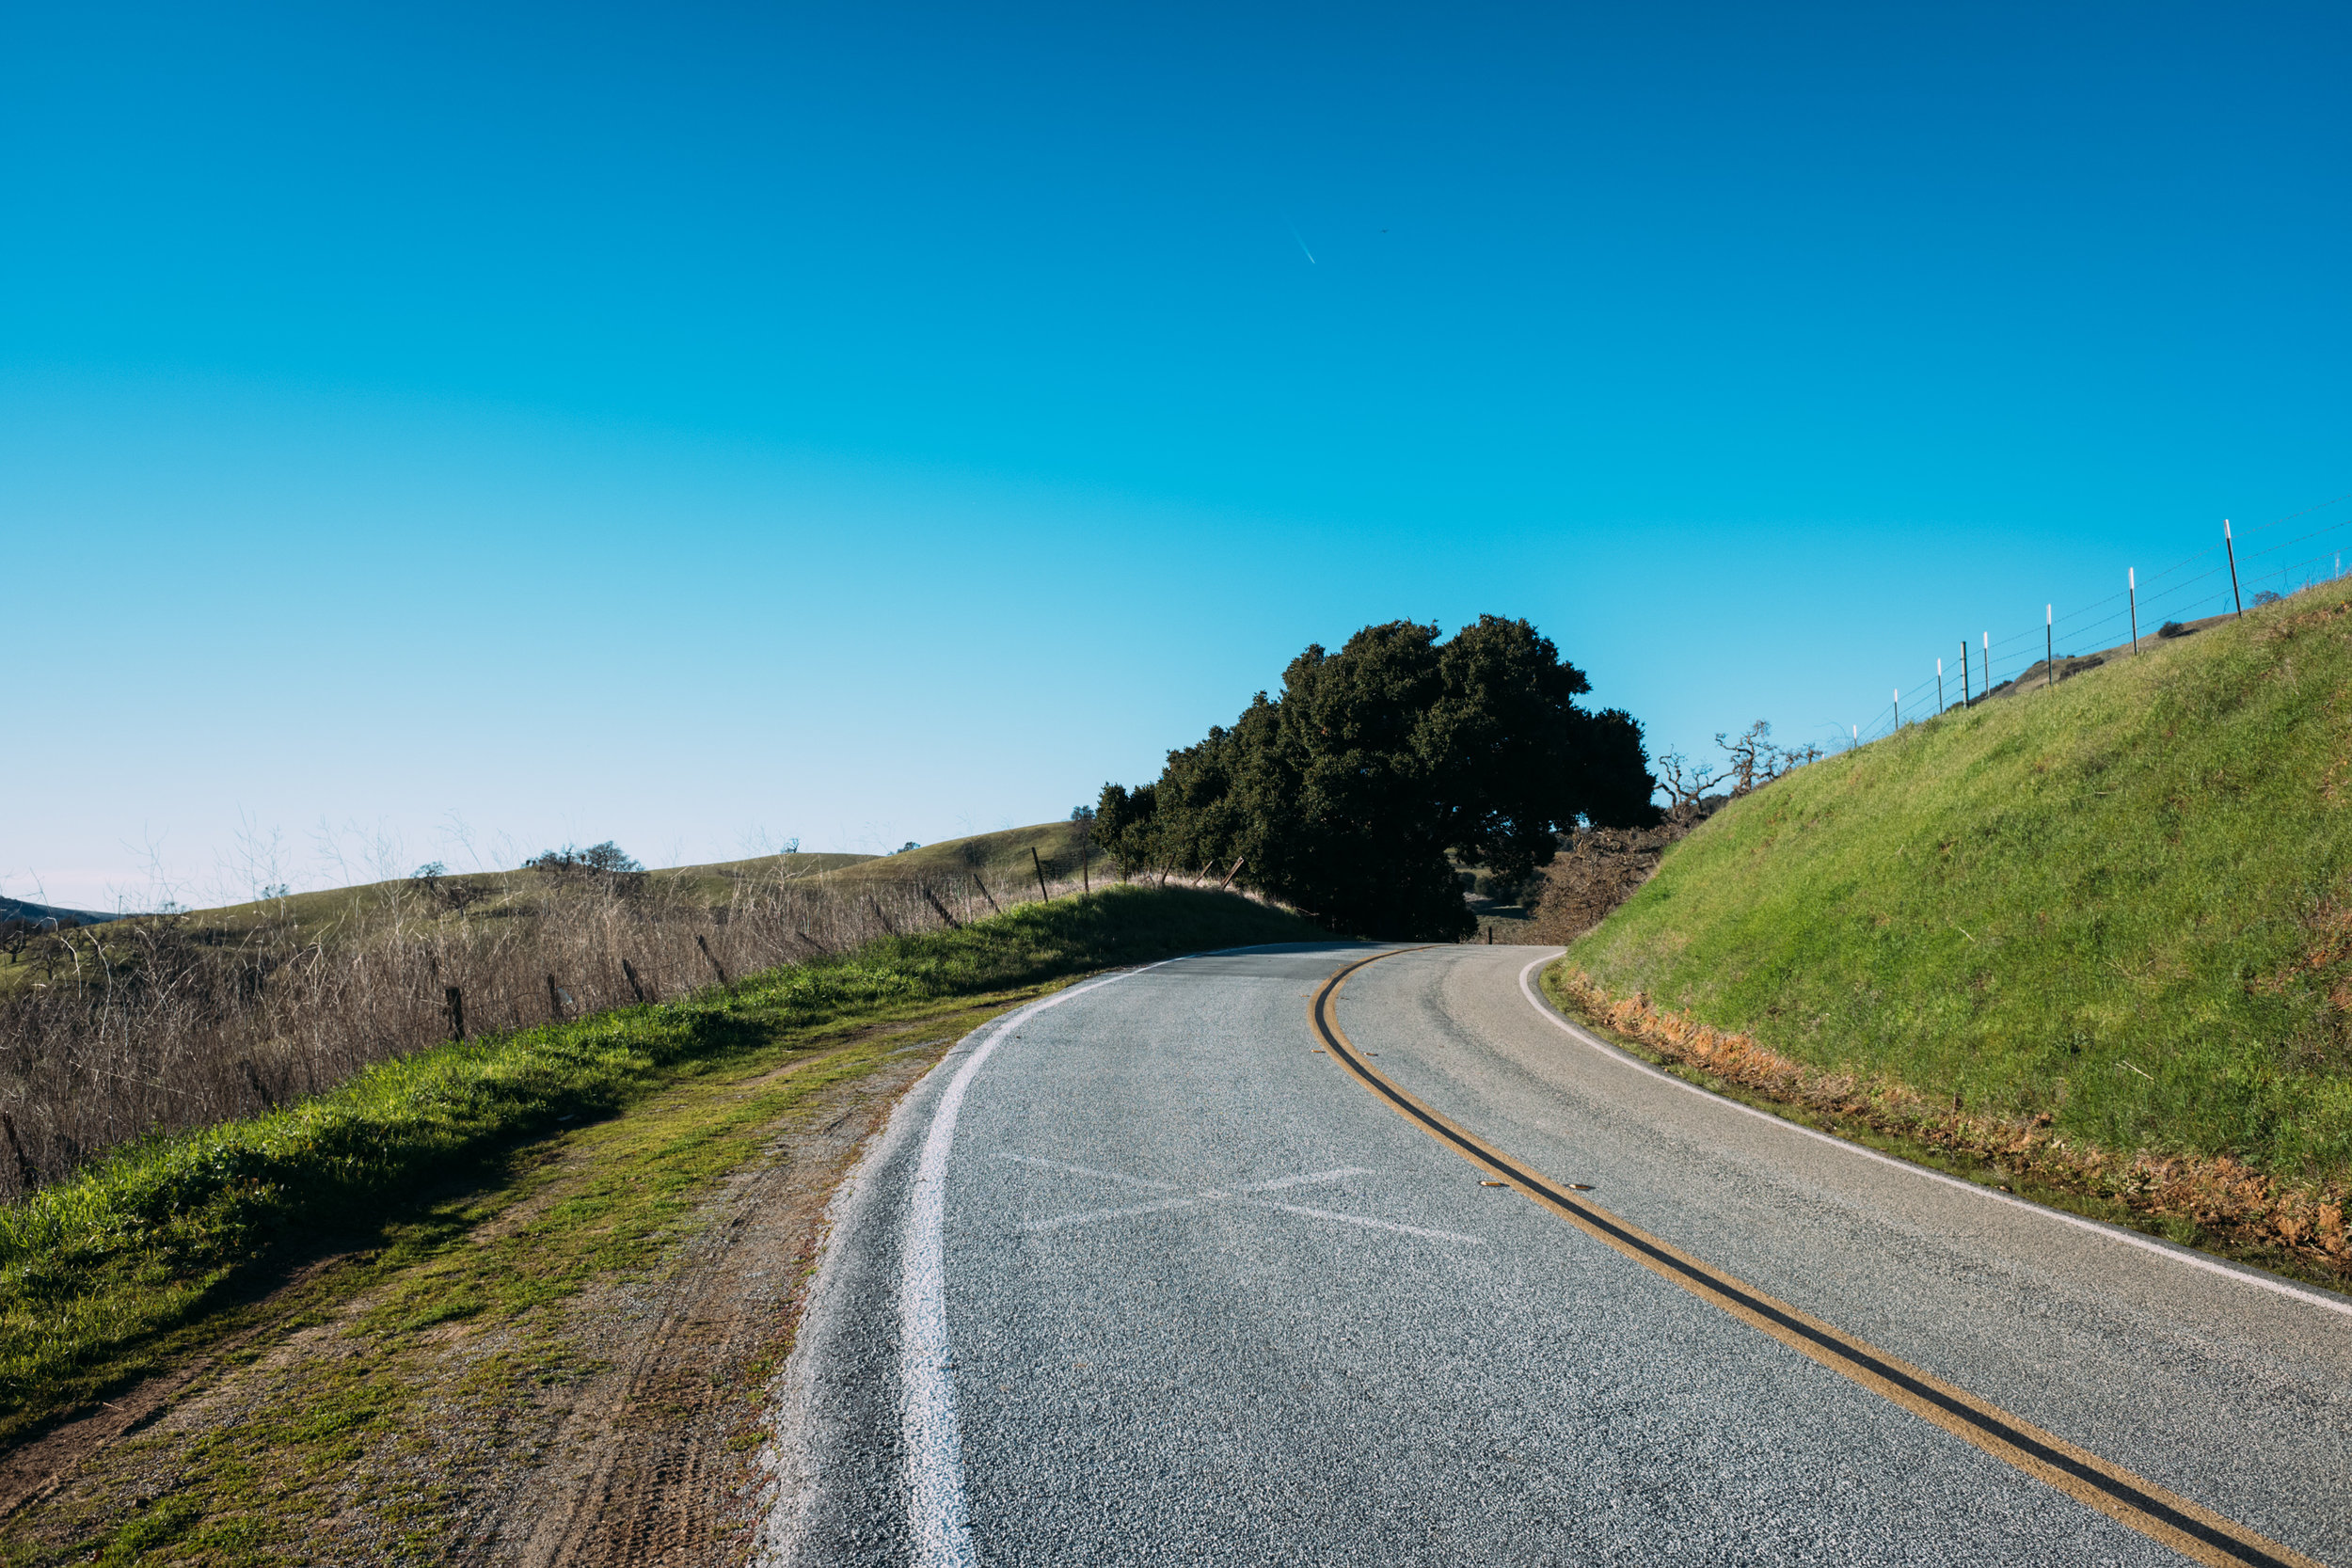 Photo Rhetoric - To Be Determined - California Riding-2002.jpg